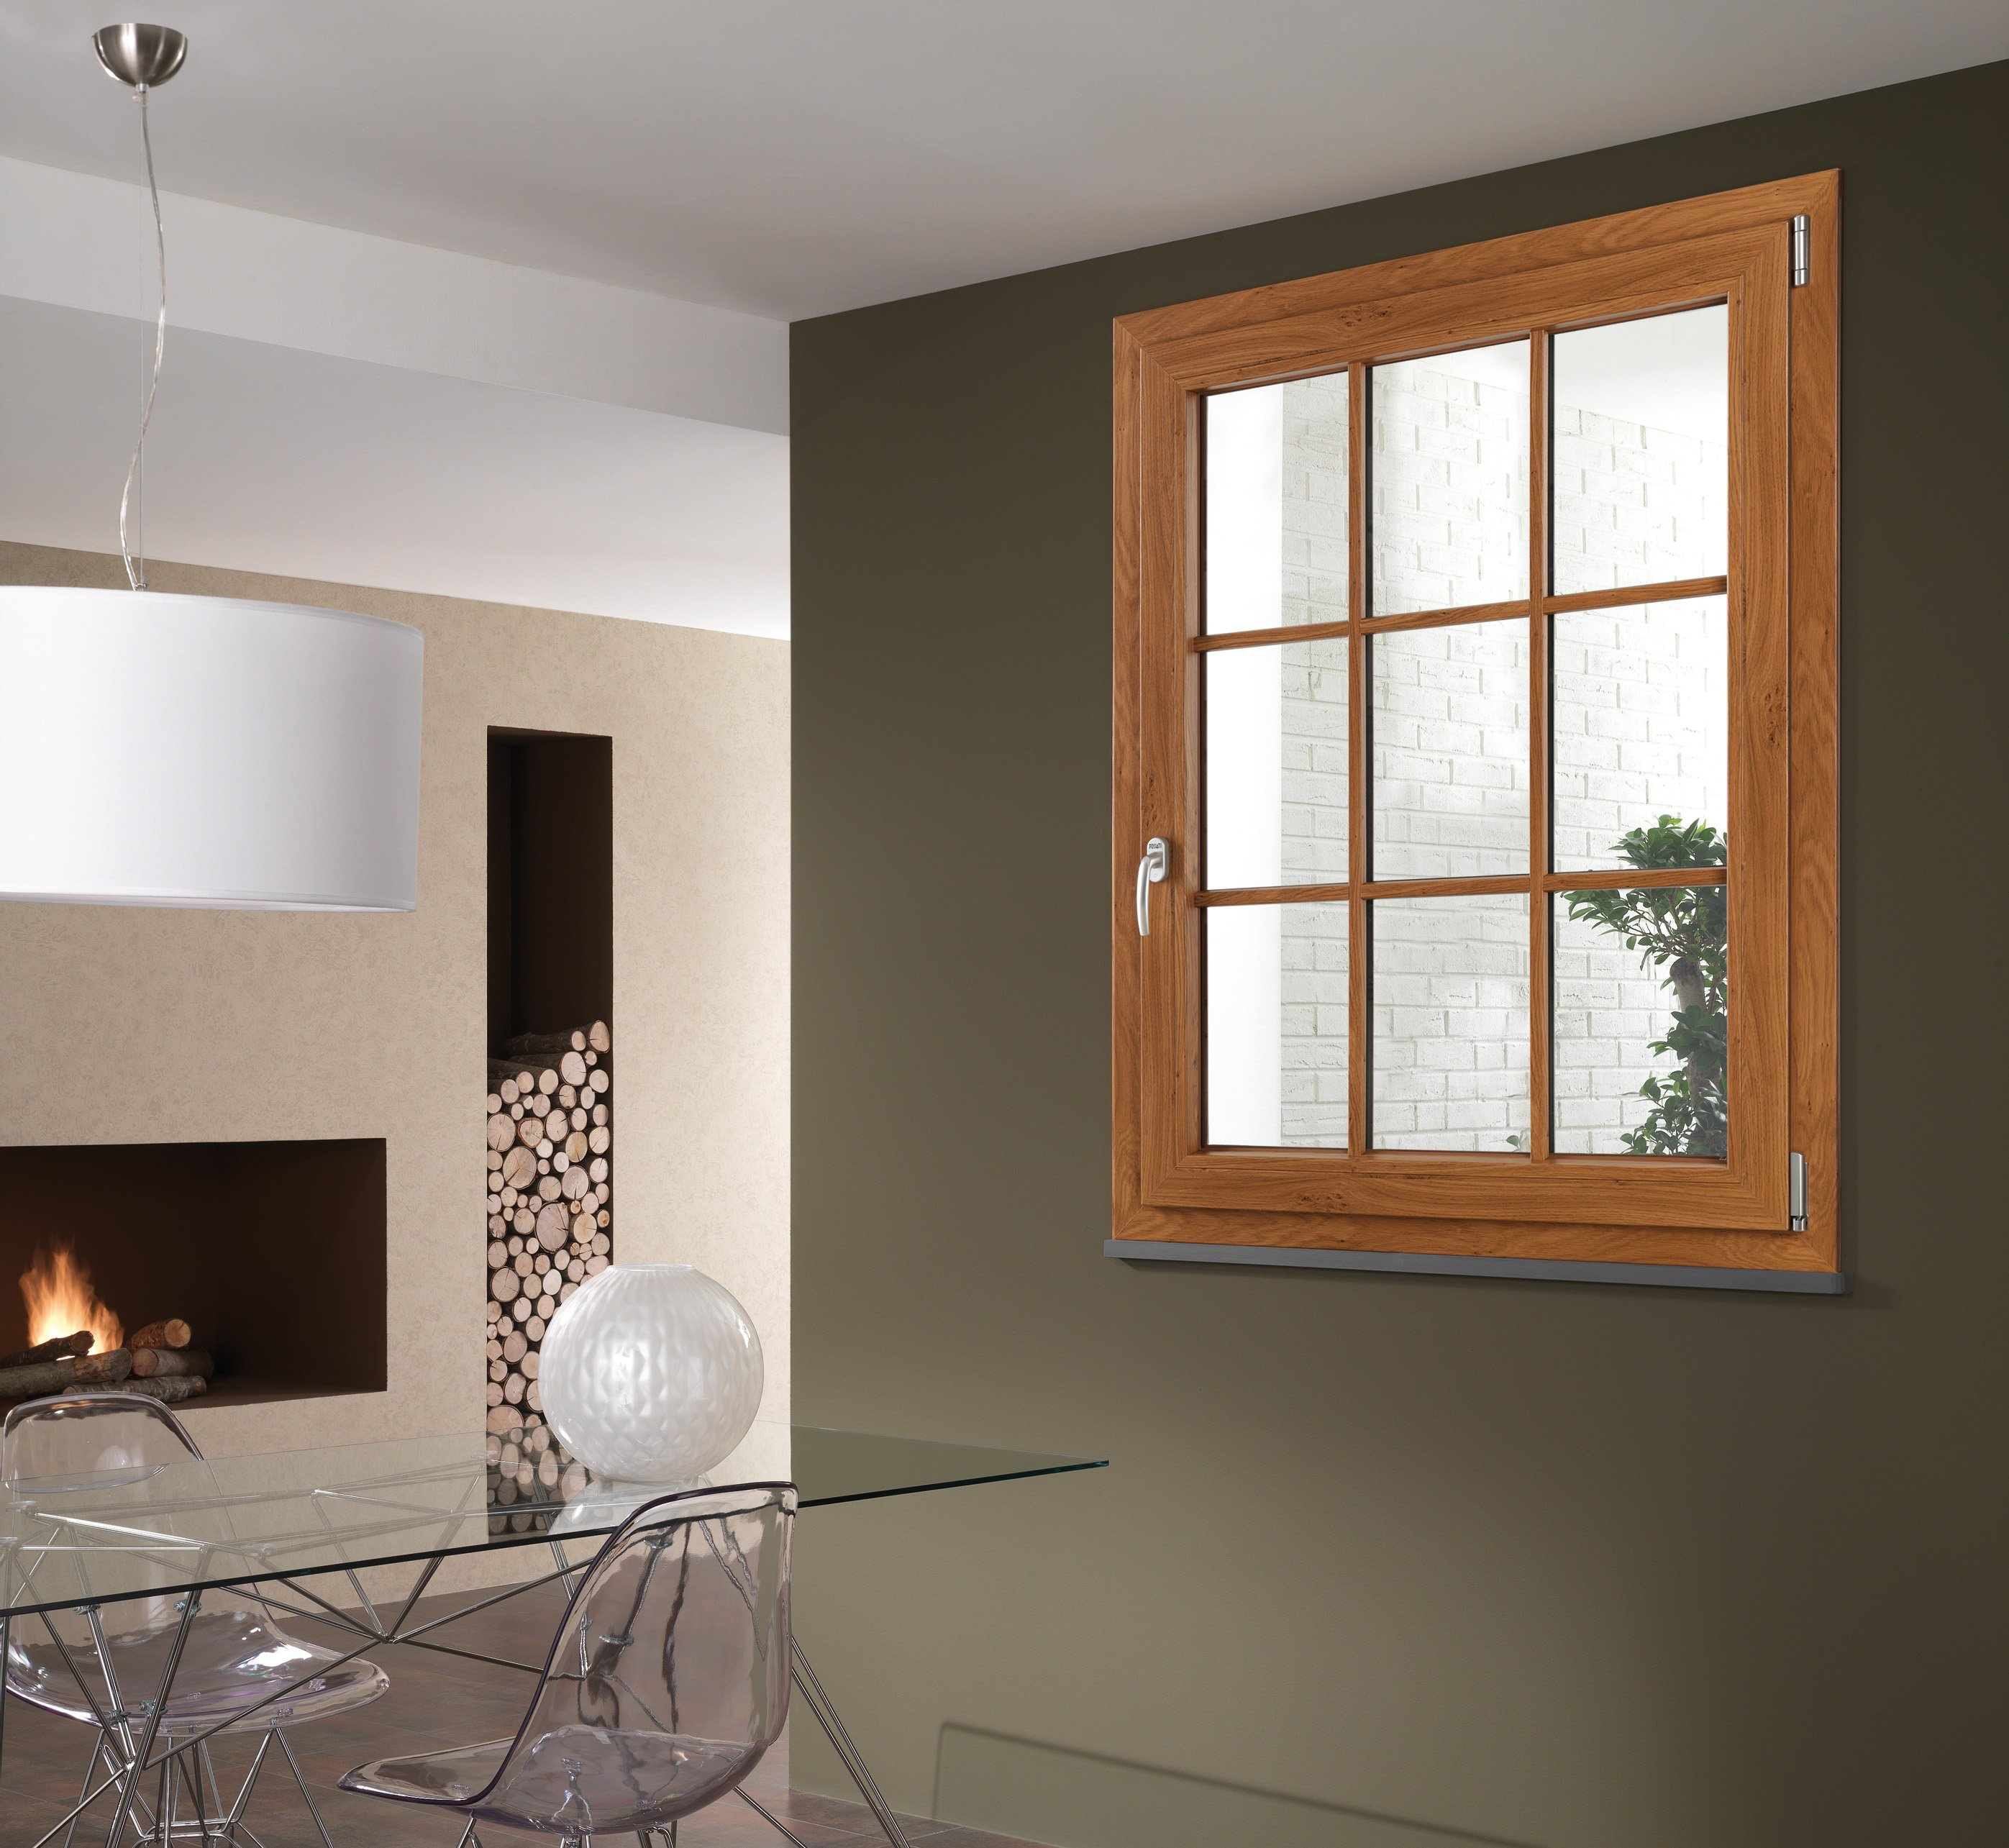 Serramenti in pvc per una perfetta tenuta cose di casa - Cambiare finestre ...